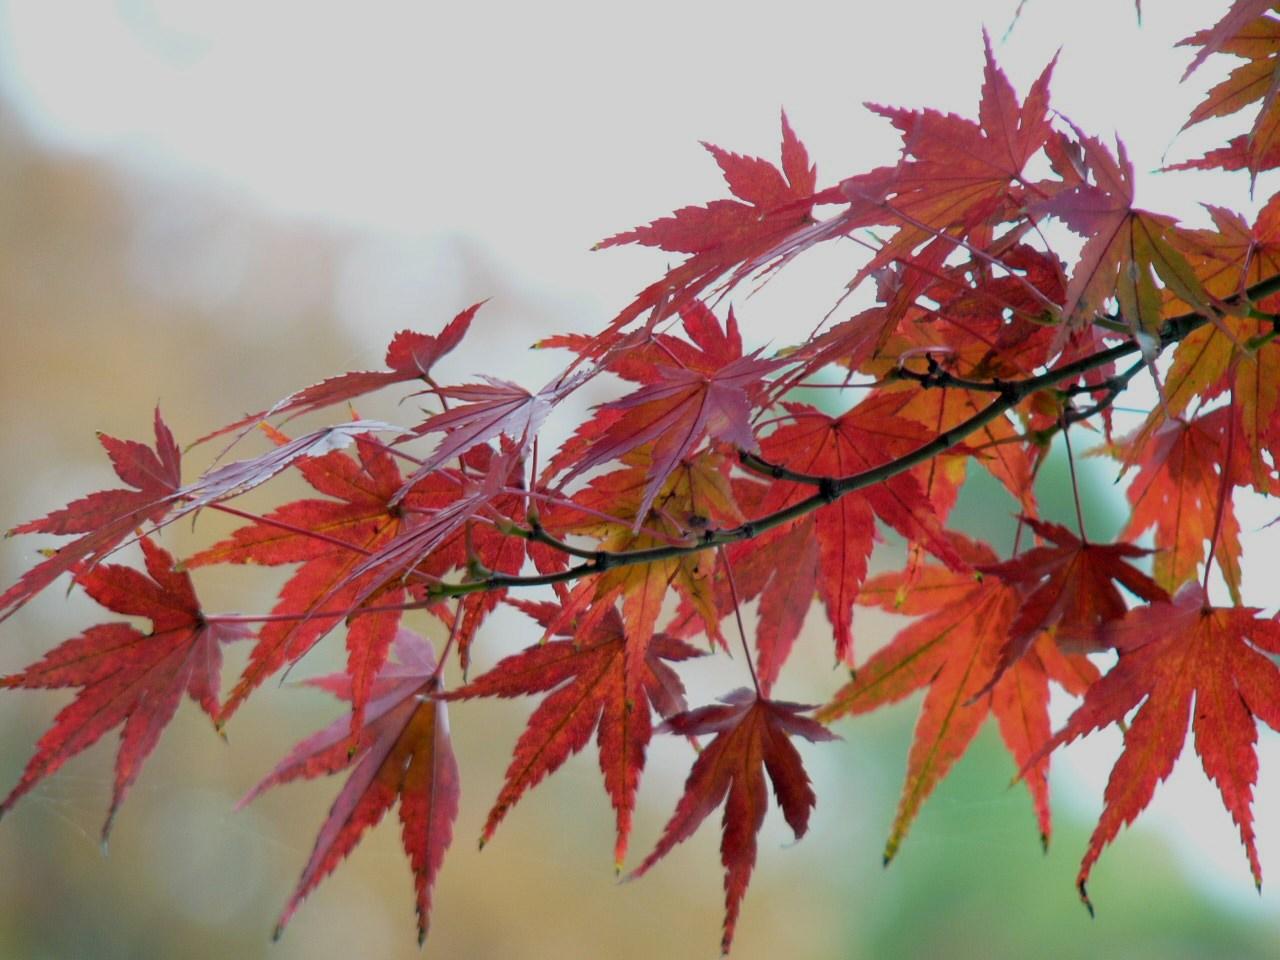 Pohon tanpa daun  Berguru